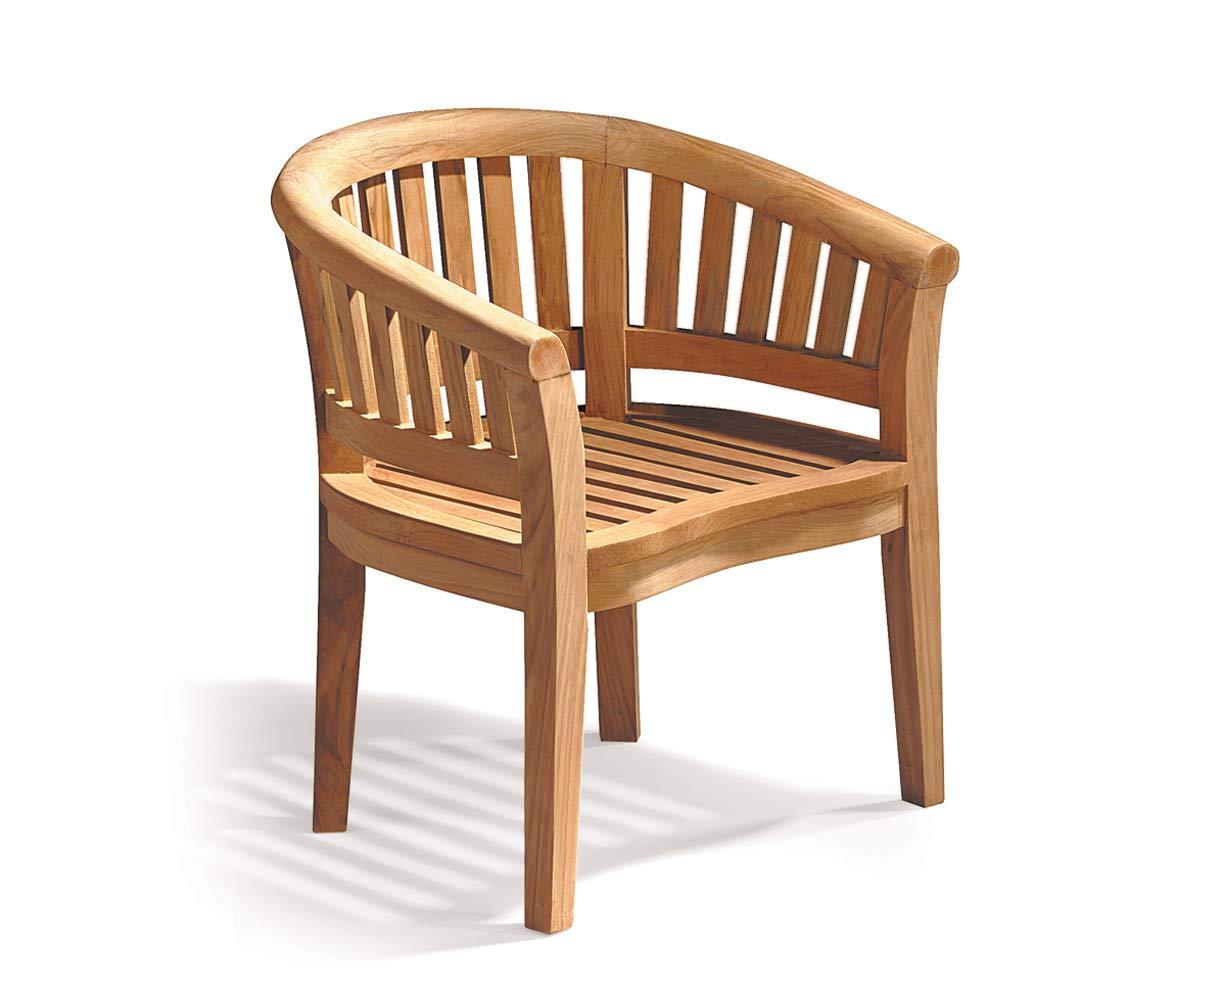 Jati Teak Curved Banana Garden Chair, Outdoor Armchair Brand, Quality & Value